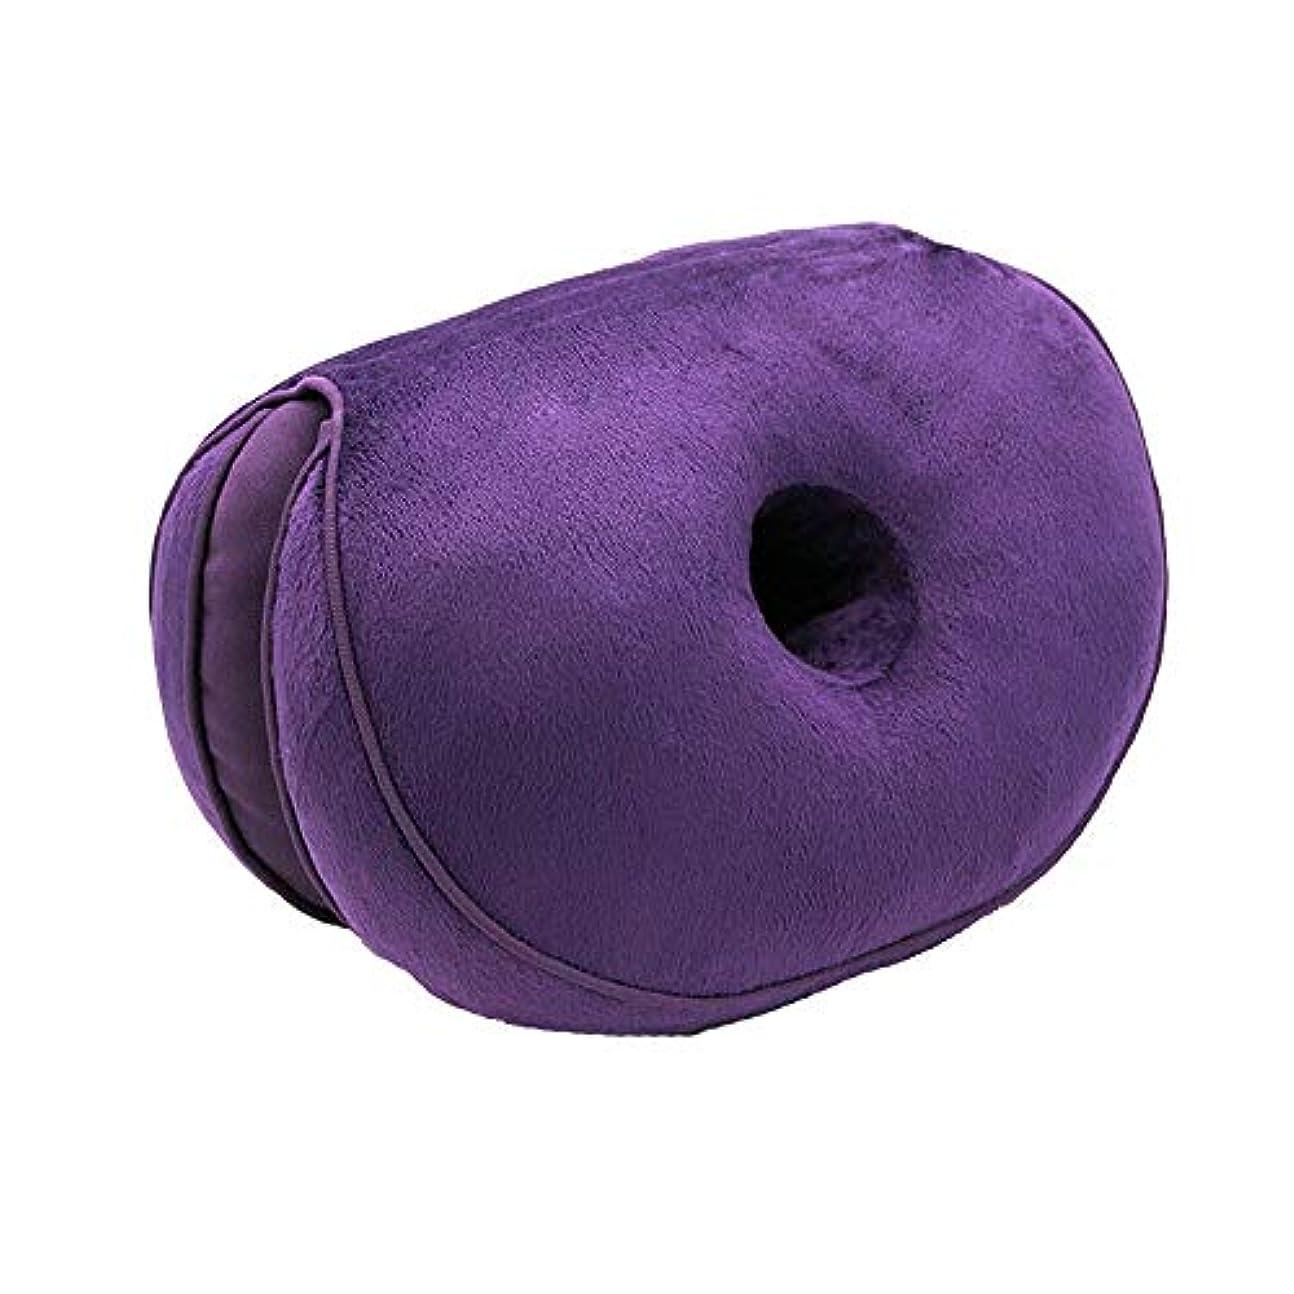 LIFE 新デュアルシートクッション低反発ラテックスオフィスチェアバックシートクッション快適な臀部マットパッド枕旅行枕女性女の子 クッション 椅子